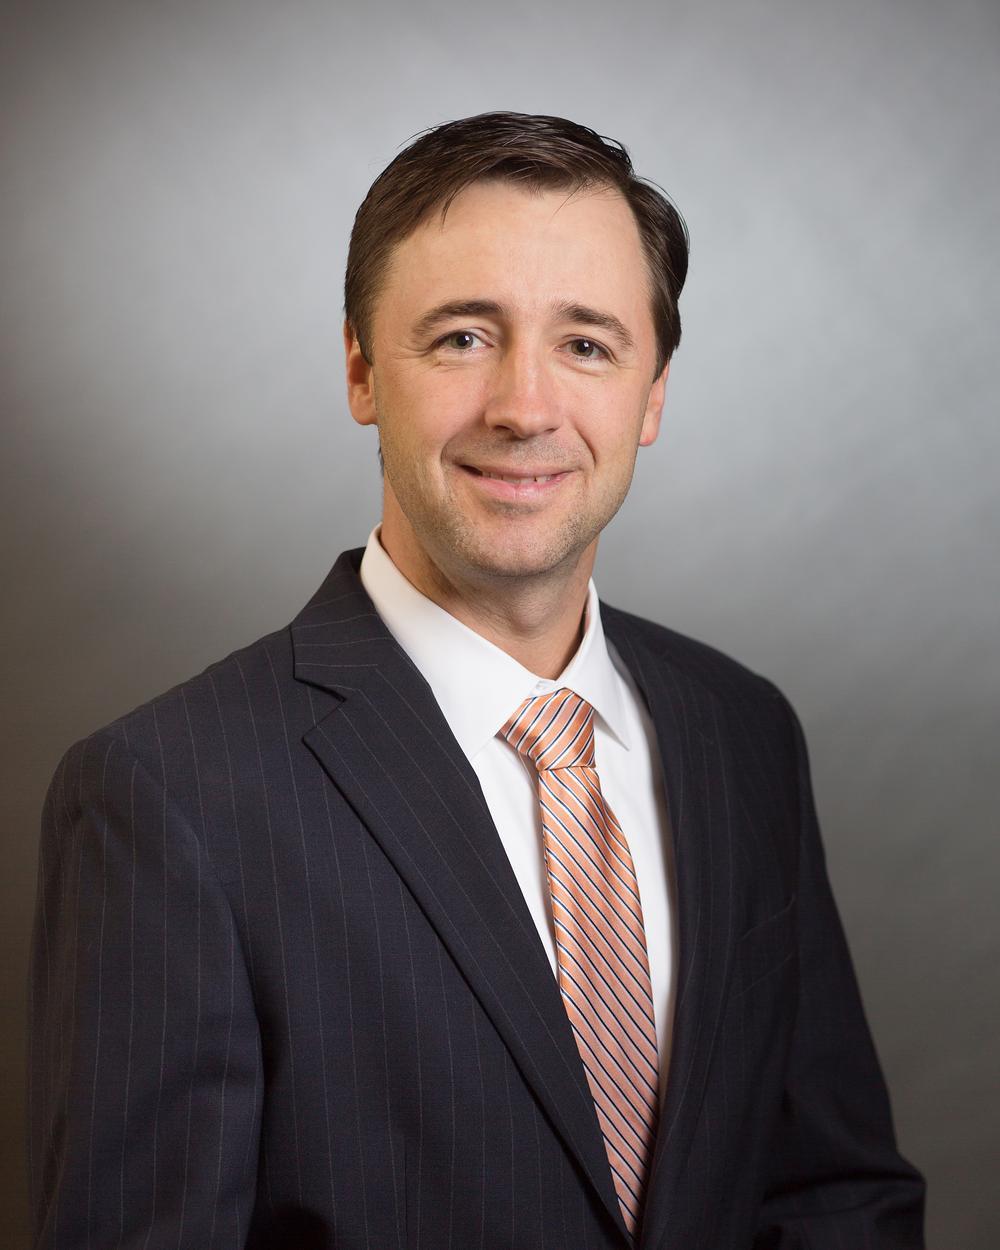 Ryan M. Franks, CFP®, ChFC®, CLU Photo